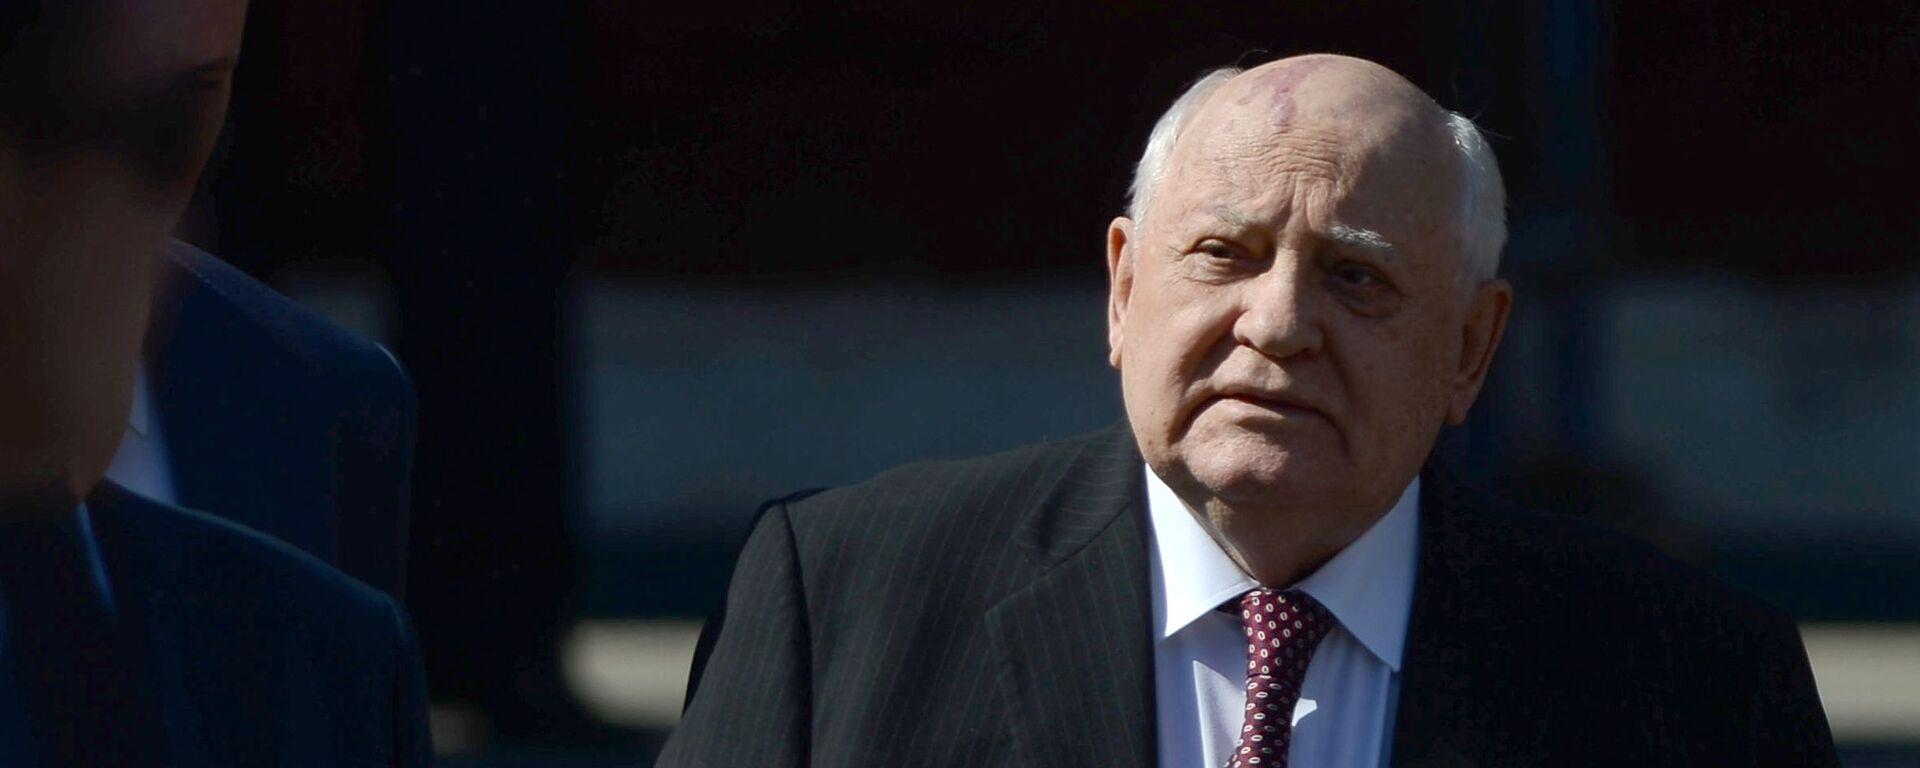 Mijaíl Gorbachov, expresidente de la Unión Soviética - Sputnik Mundo, 1920, 01.03.2021